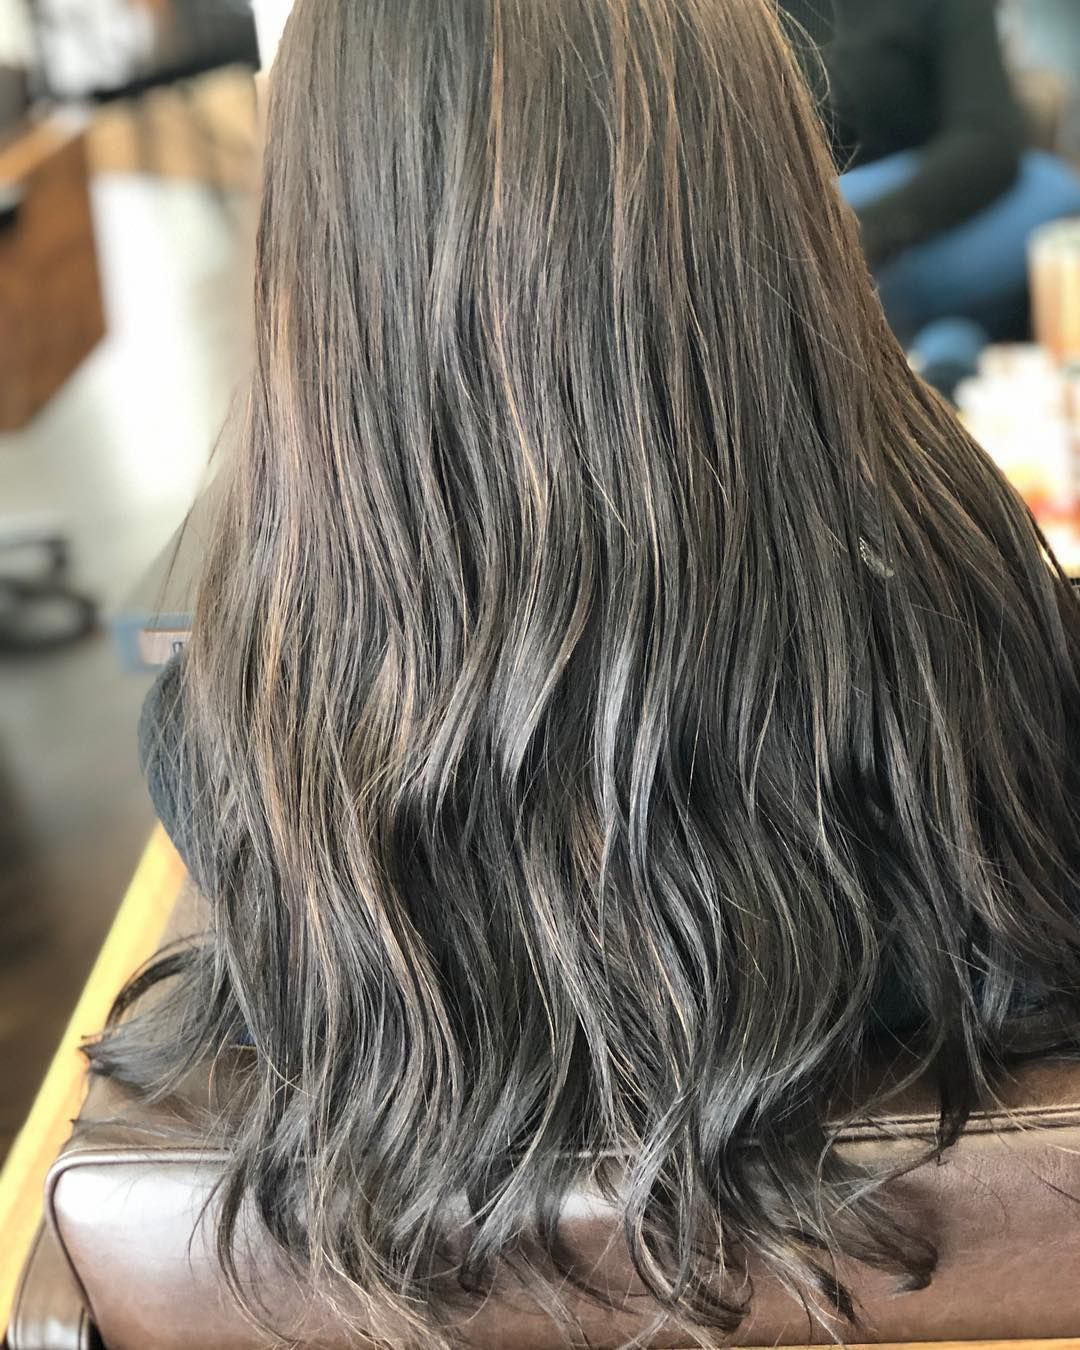 sayaka katanoはinstagramを利用しています お客様フォト この春に高校を卒業予定の高校生 明るすぎず 暗すぎず 可愛く大人っぽい アッシュグレージュとハイライトで アクセント 可愛すぎて二度見するー アッシュグレ hair styles long hair styles beauty